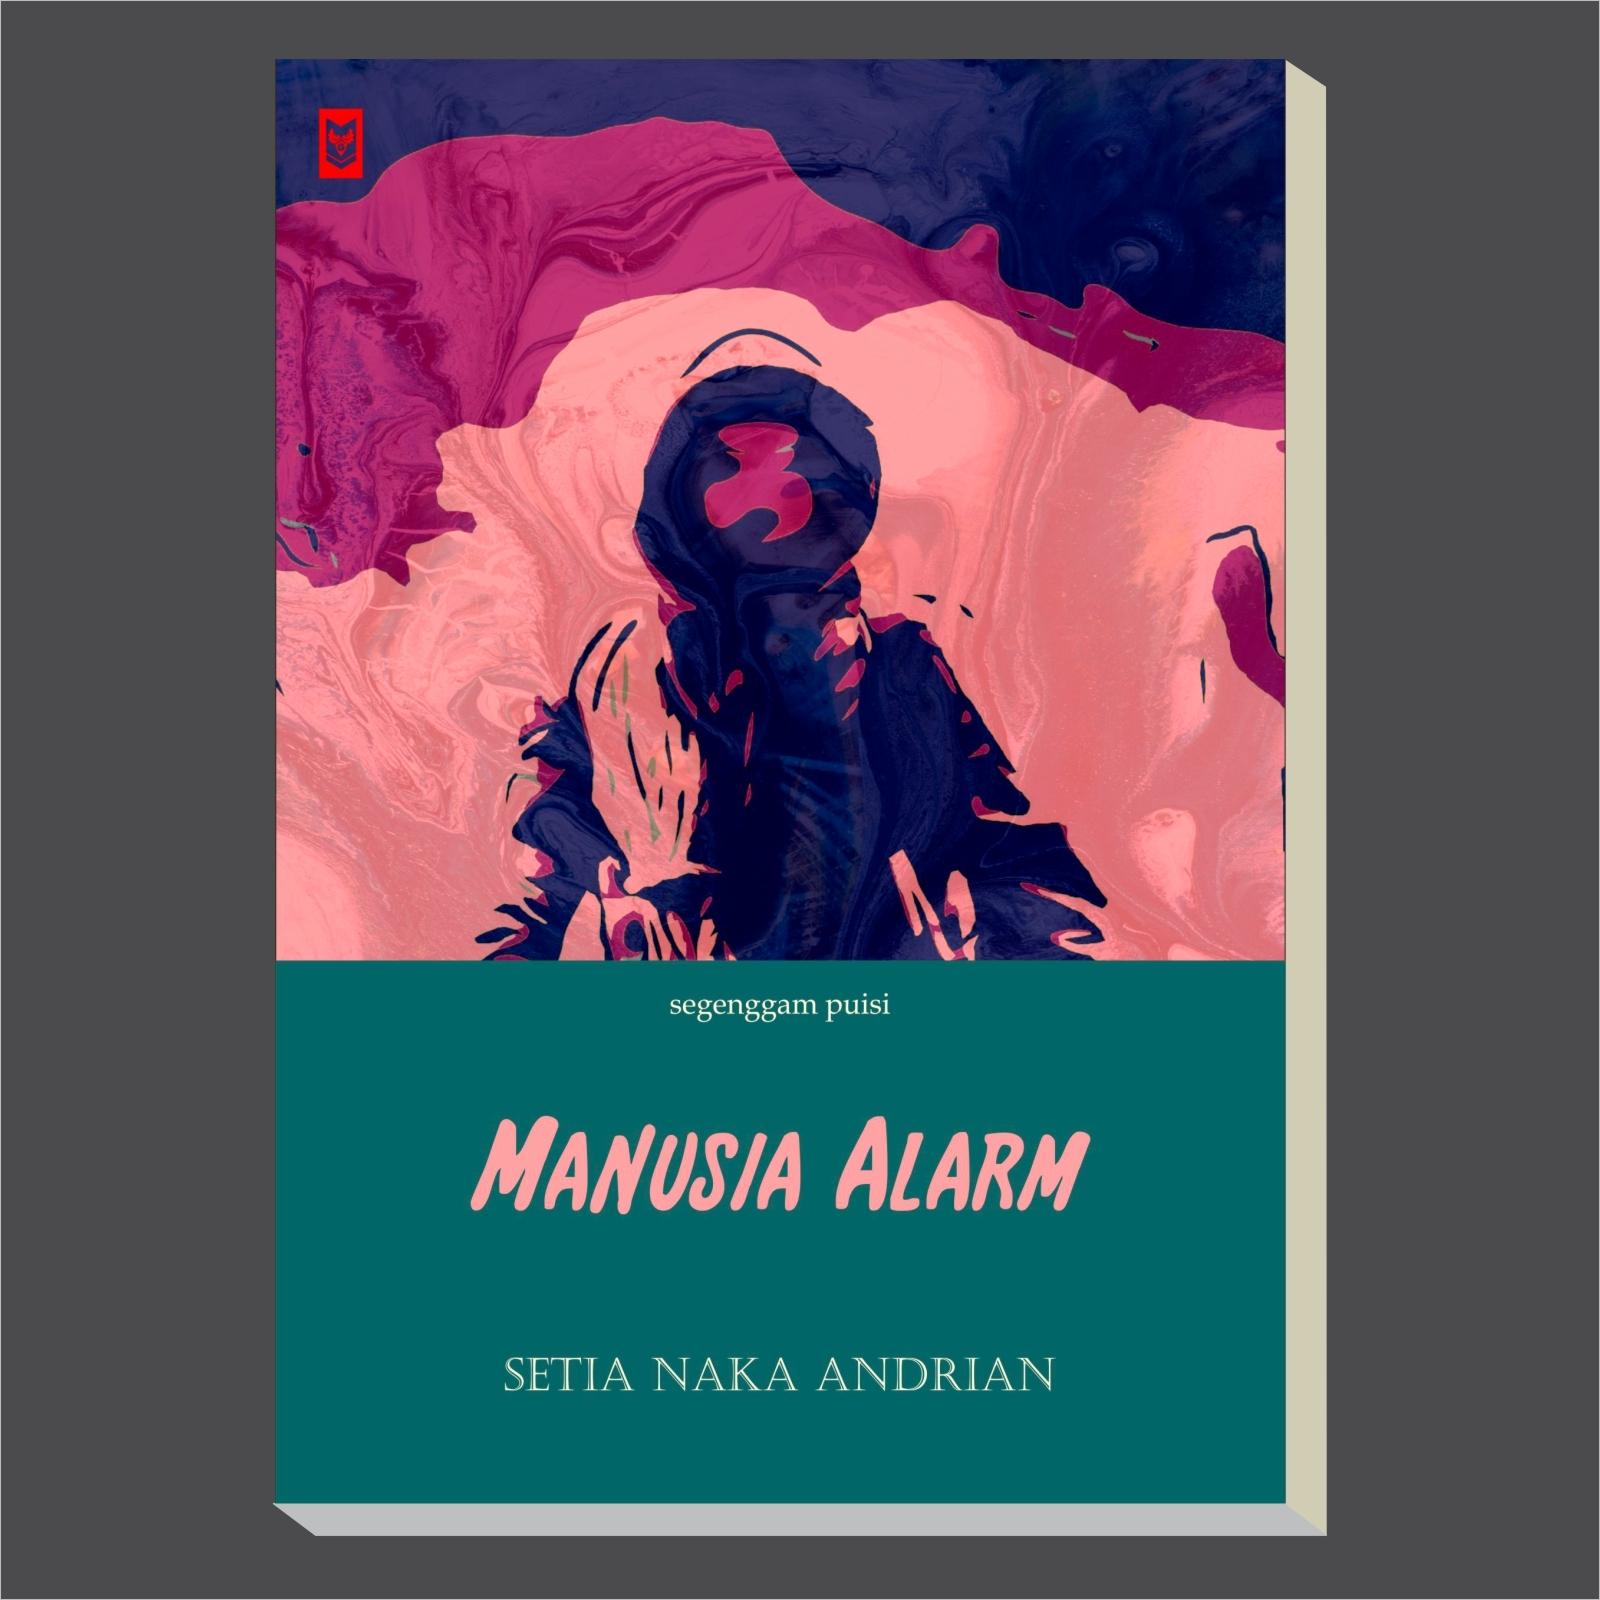 Manusia Alarm : Segenggam Puisi Setia Naka Andrian - Blanja.com